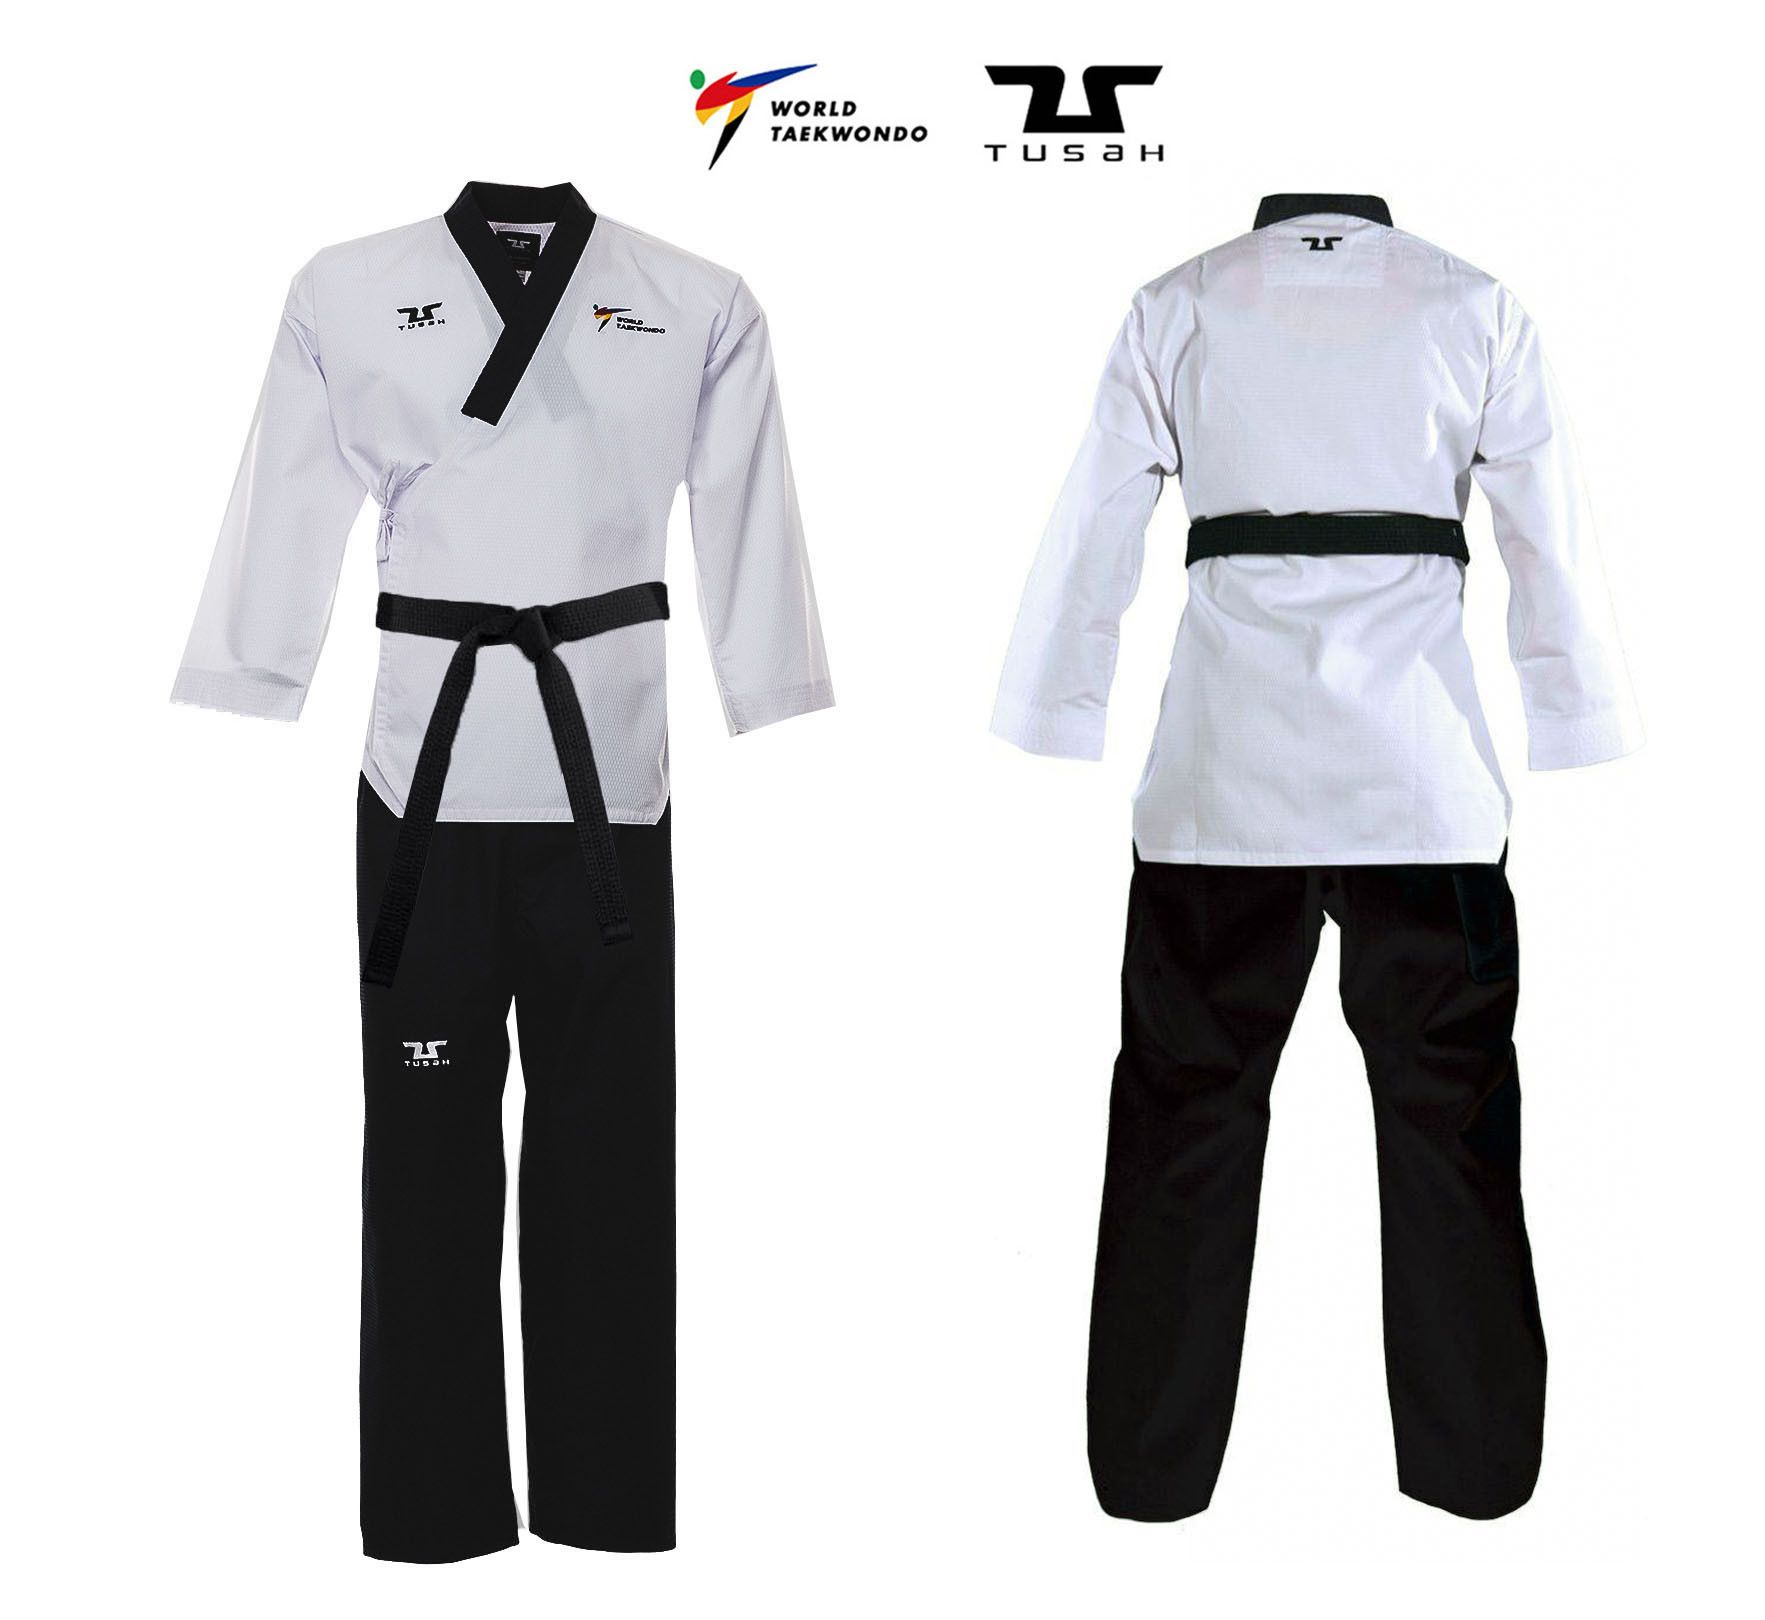 Poomsae Professional Maschile Tusah per Taekwondo Omologato WT Made in Korea per forme e competizioni